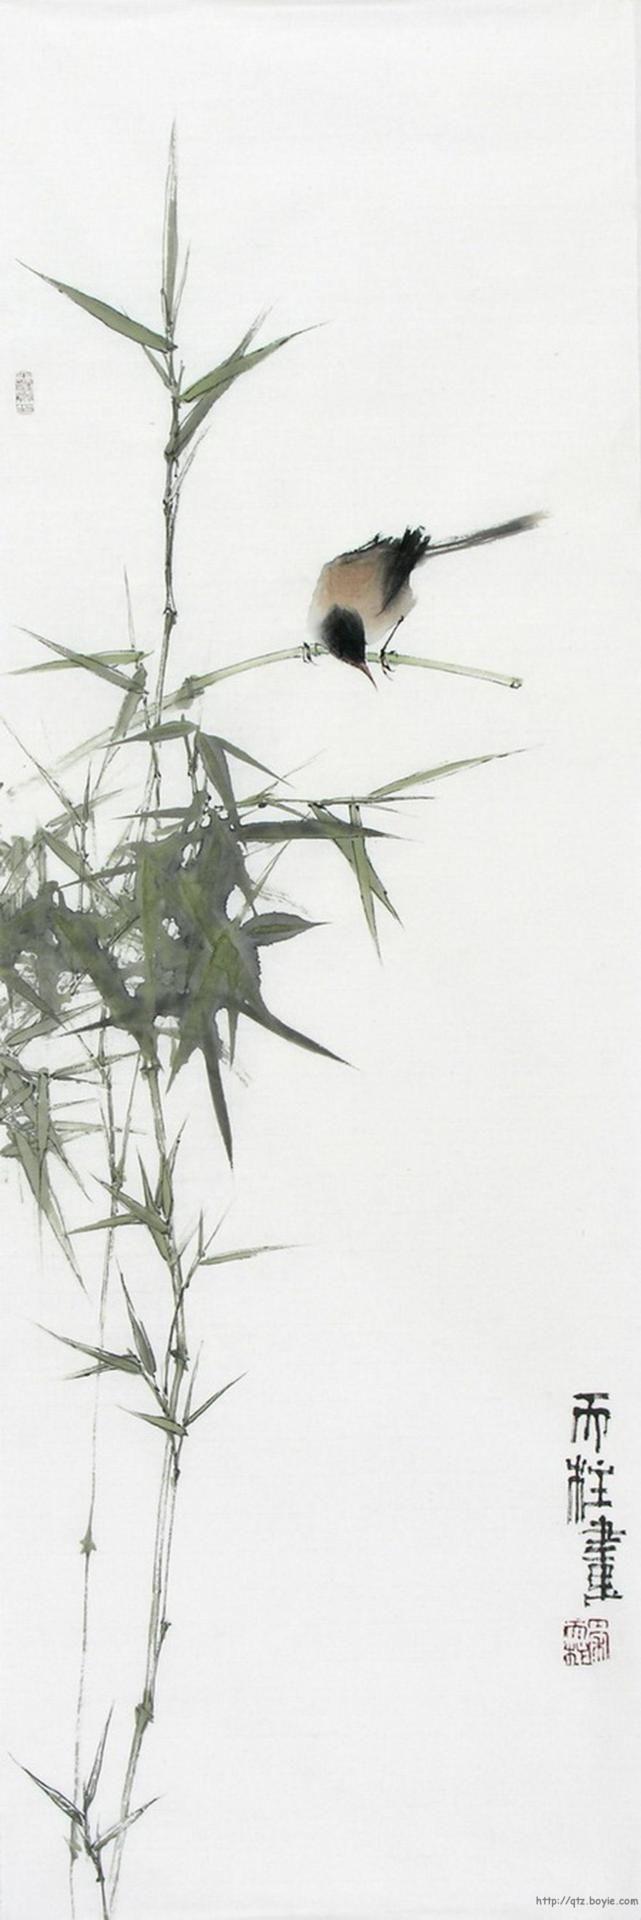 ♂ Asian ink art Chinese watercolor Bamboo and bird Qin Tianzhu #watercolor jd